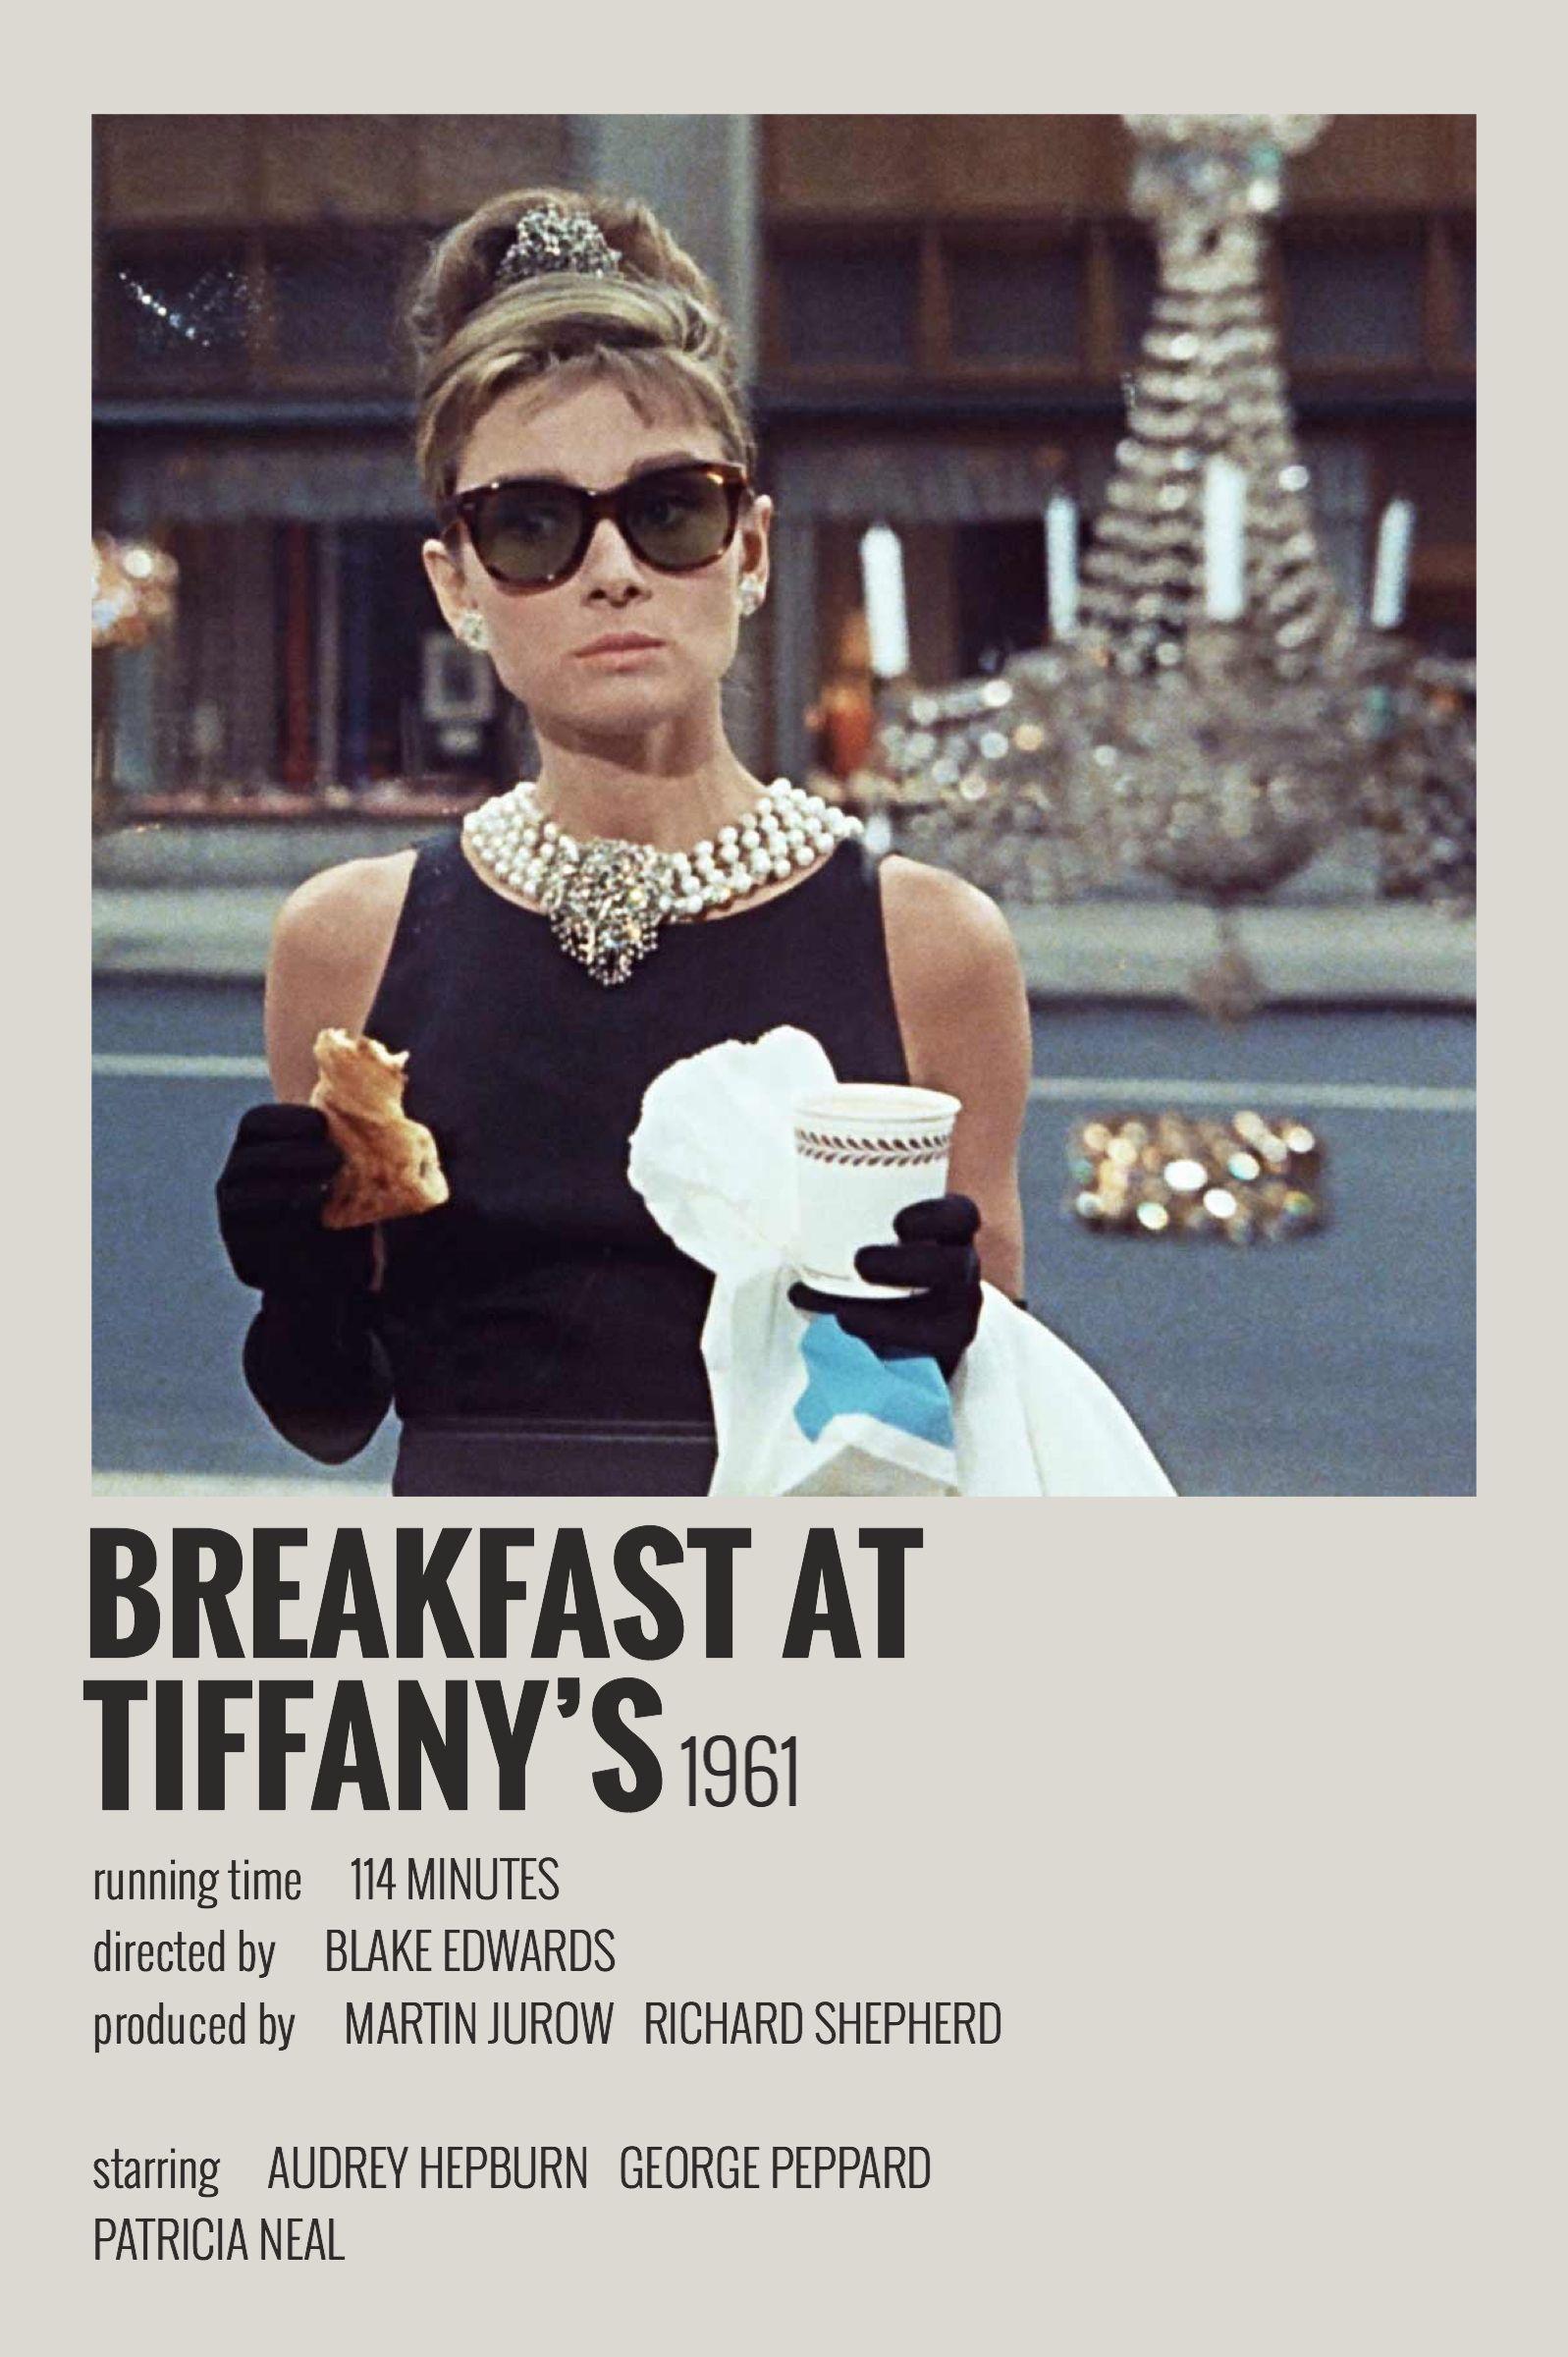 Alternative Minimalist Movie/Show Polaroid Poster - Breakfast at Tiffany's